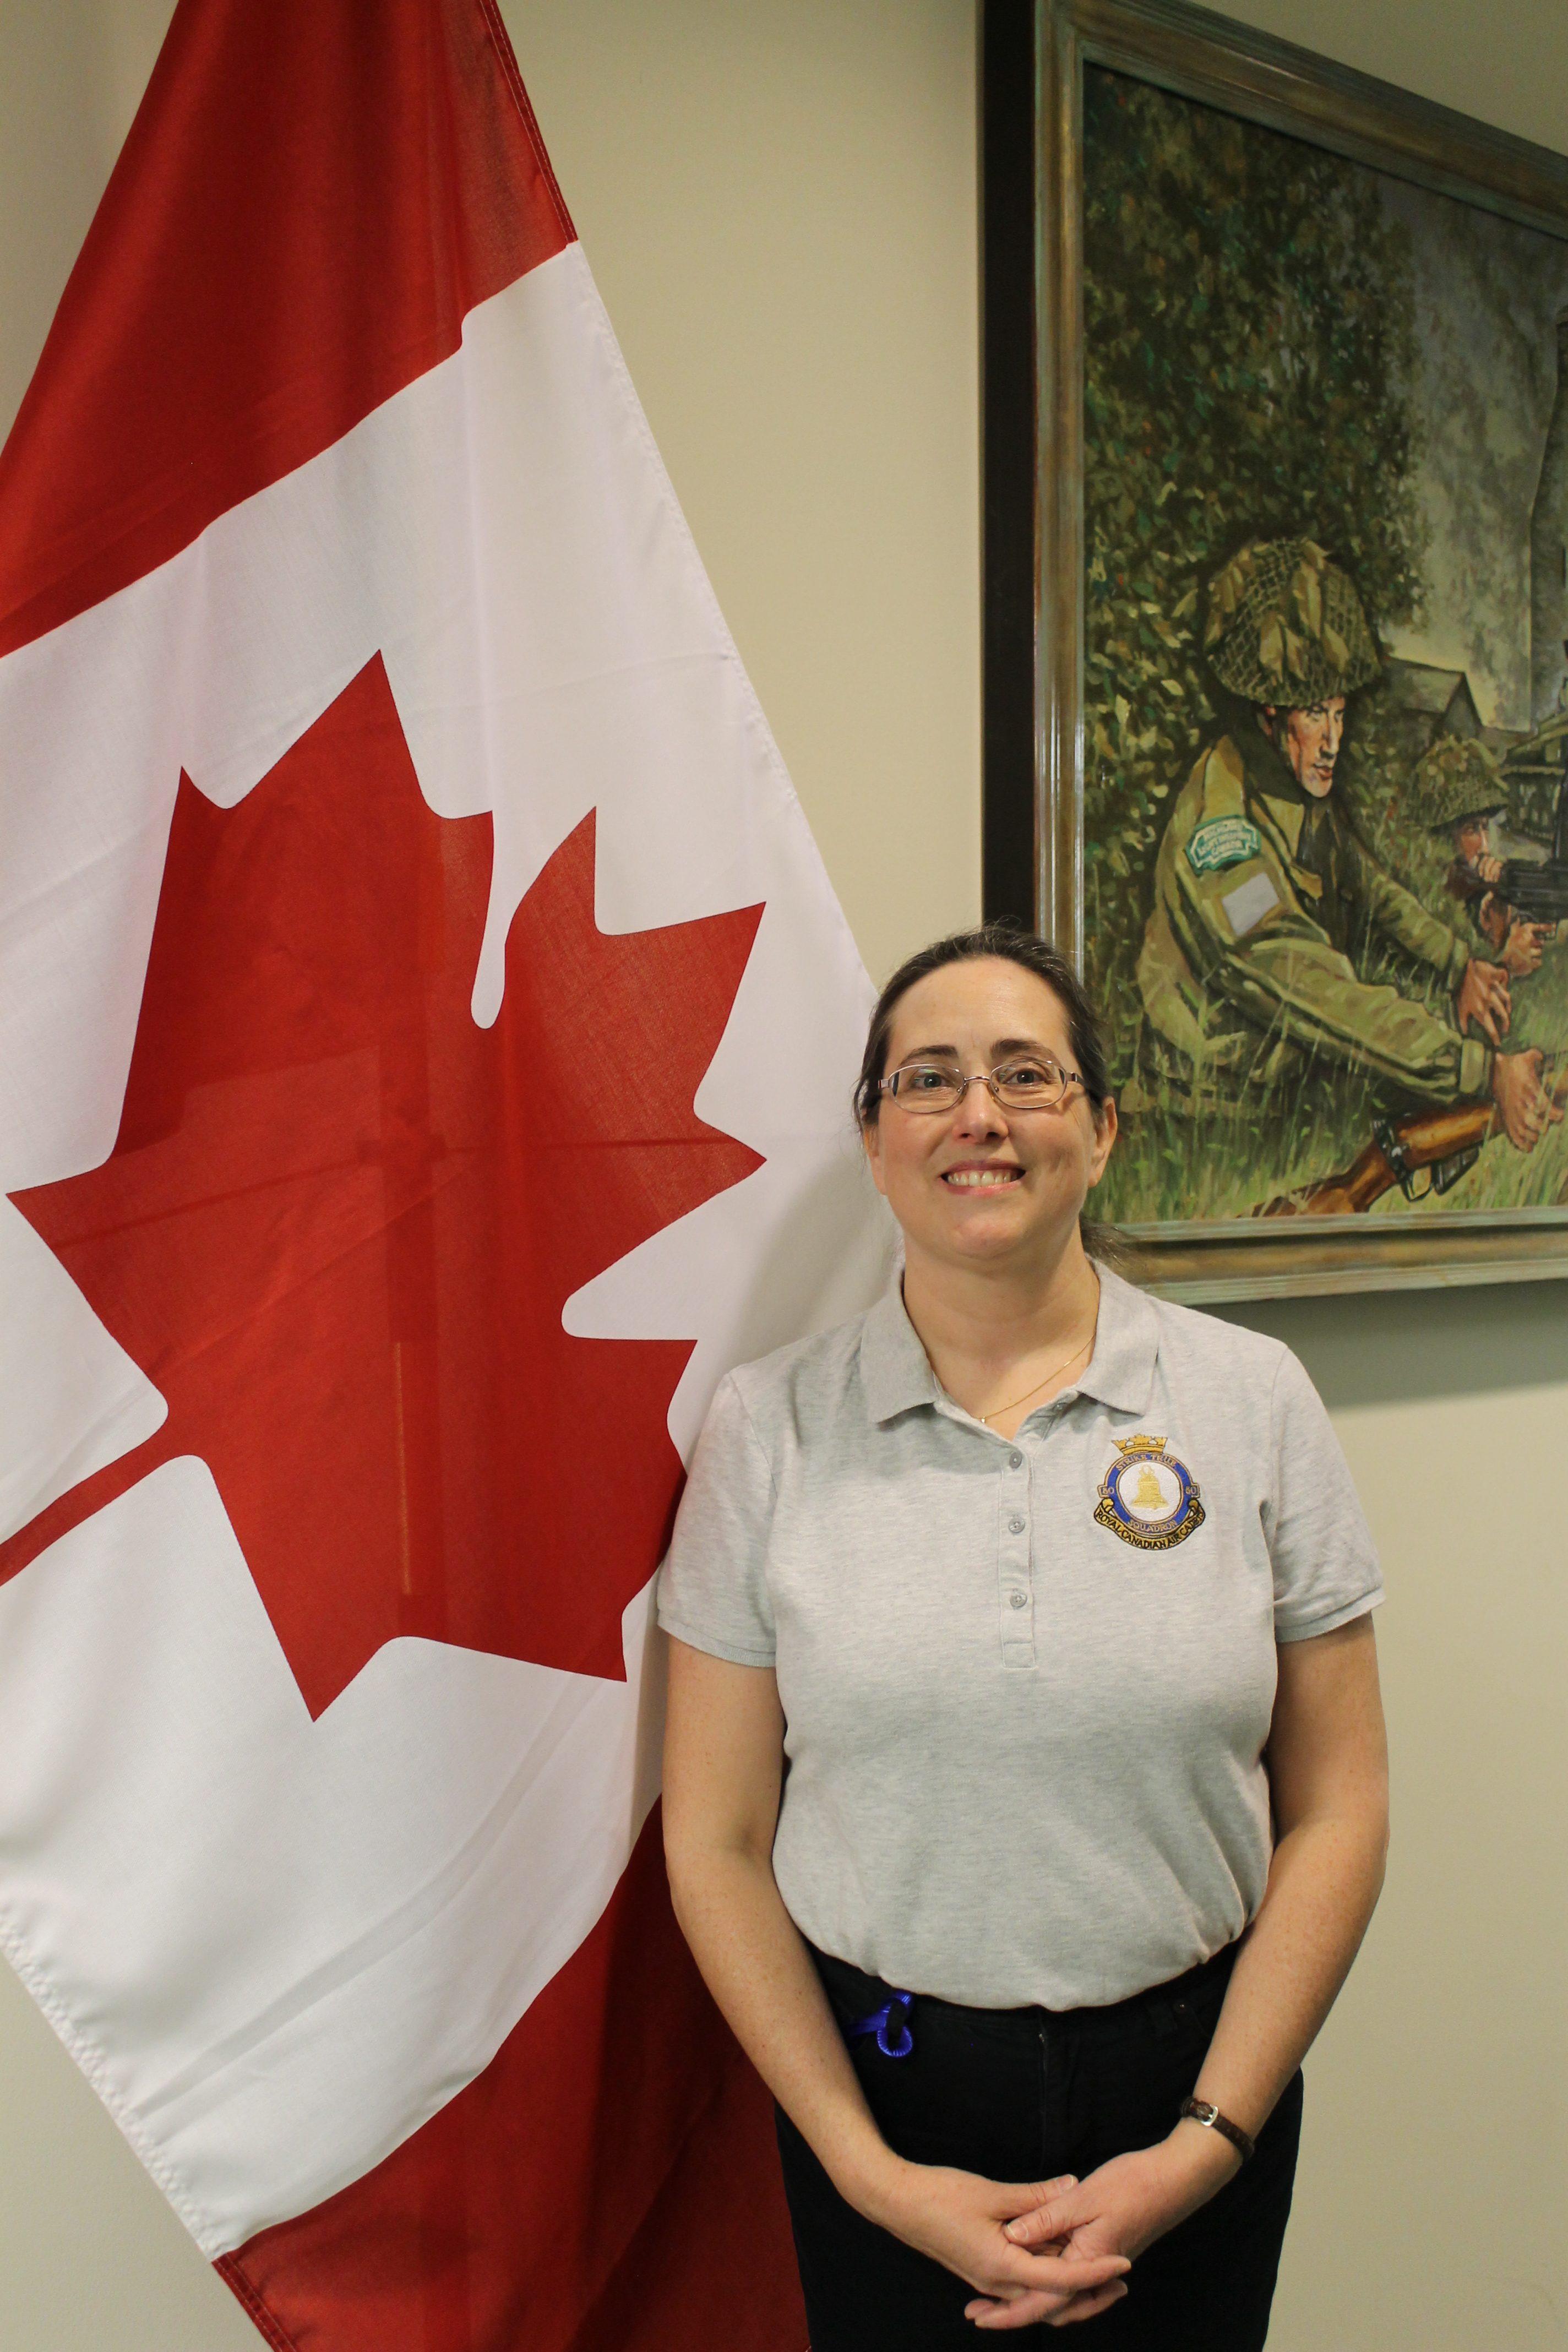 Civilian Volunteer April Wettig